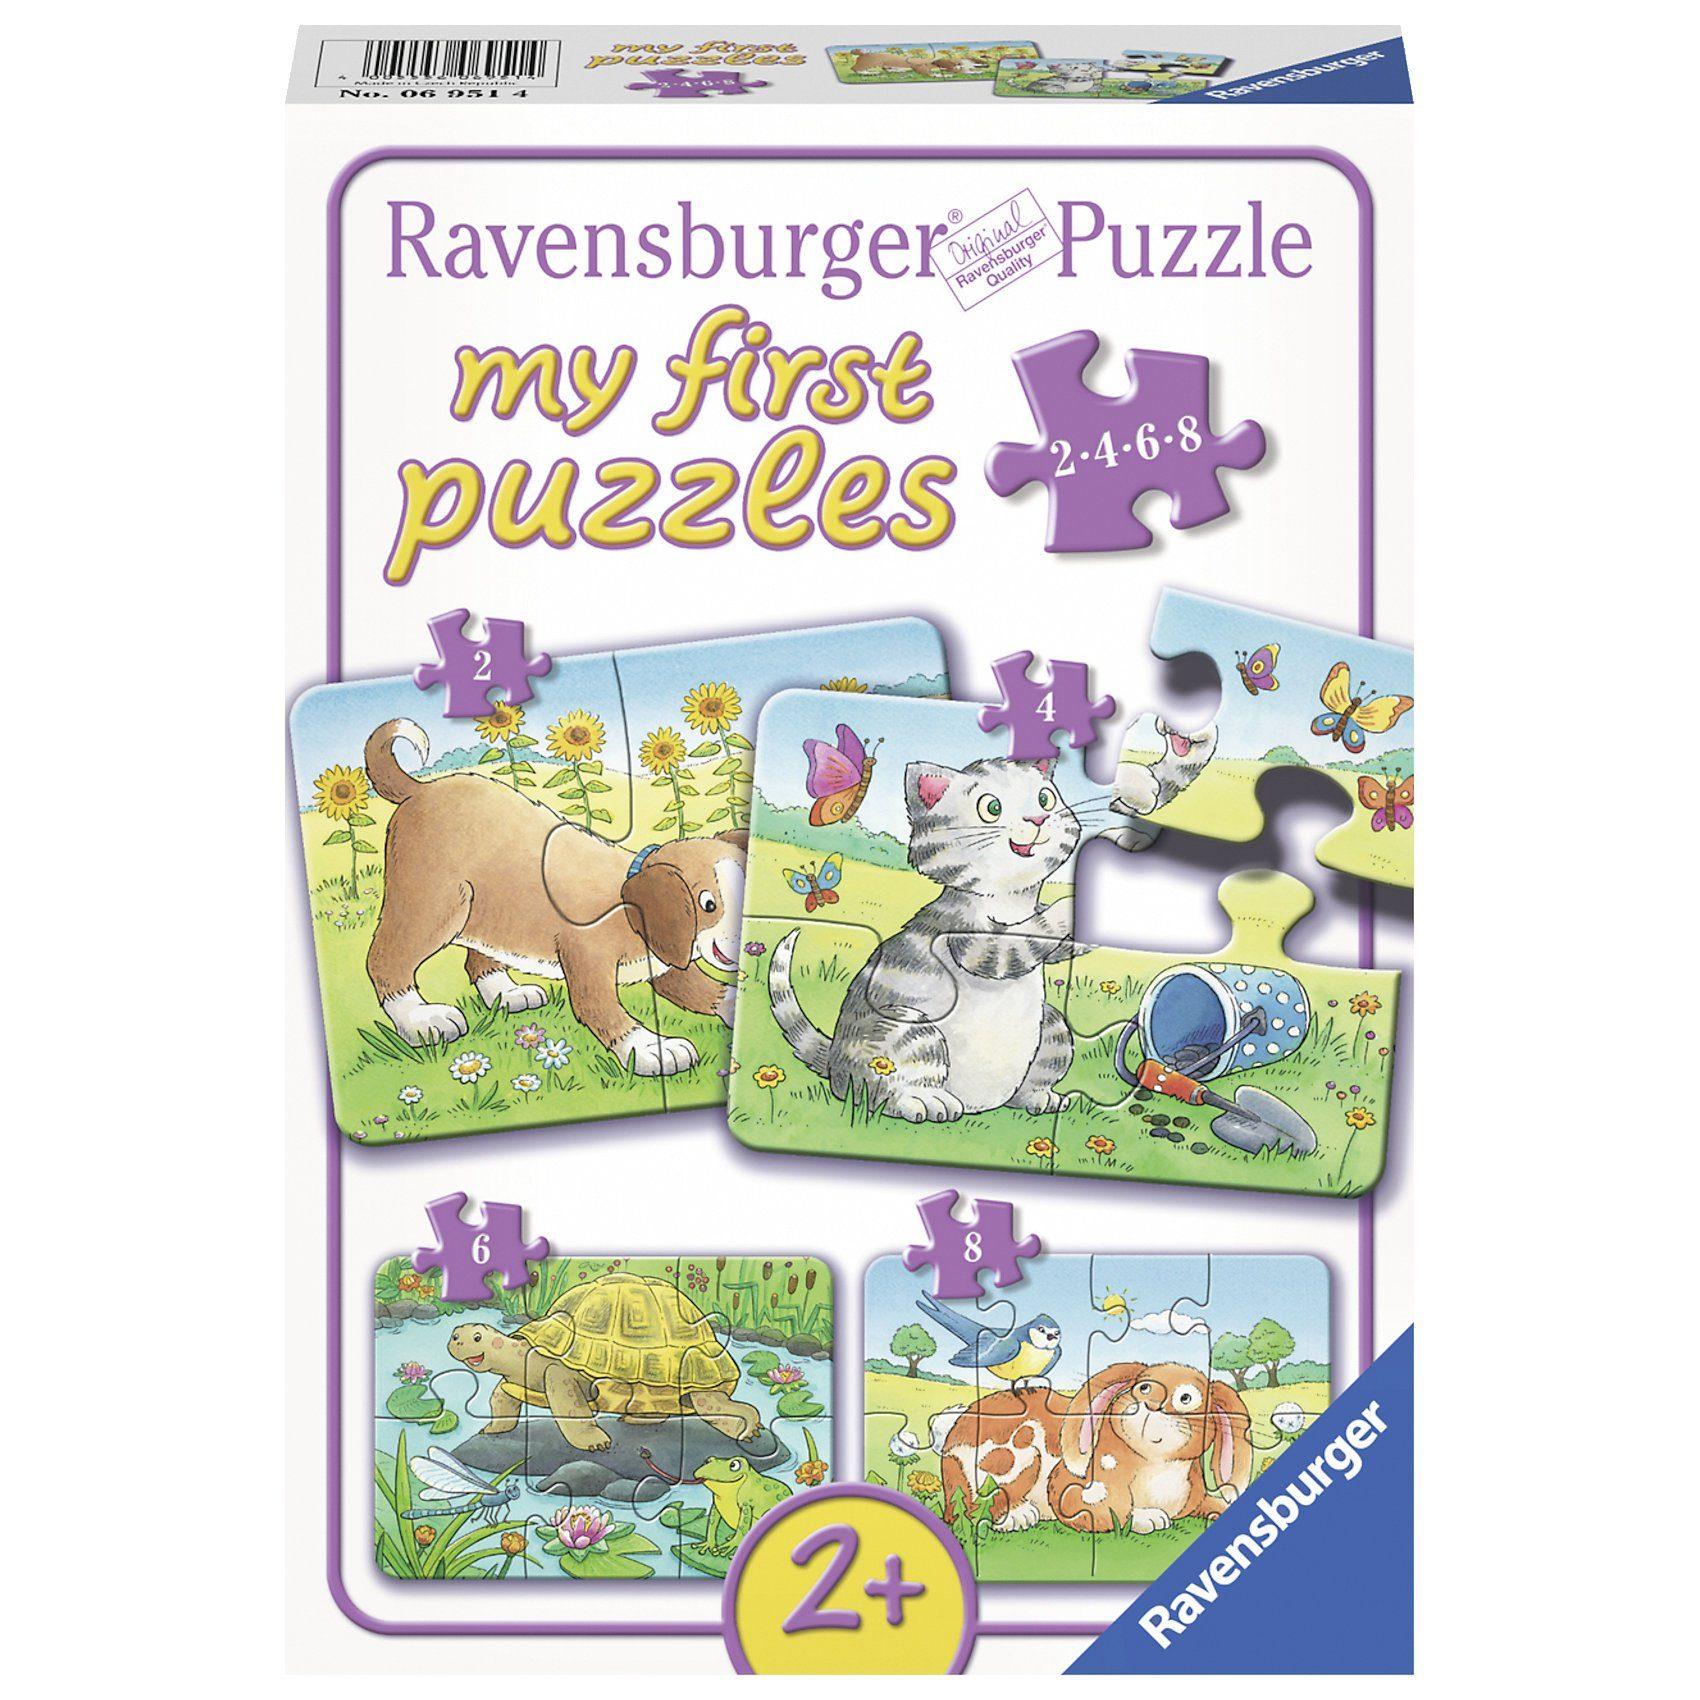 Ravensburger my first Puzzle Puzzleset 2,4,6,8 Teile Niedliche Haustiere